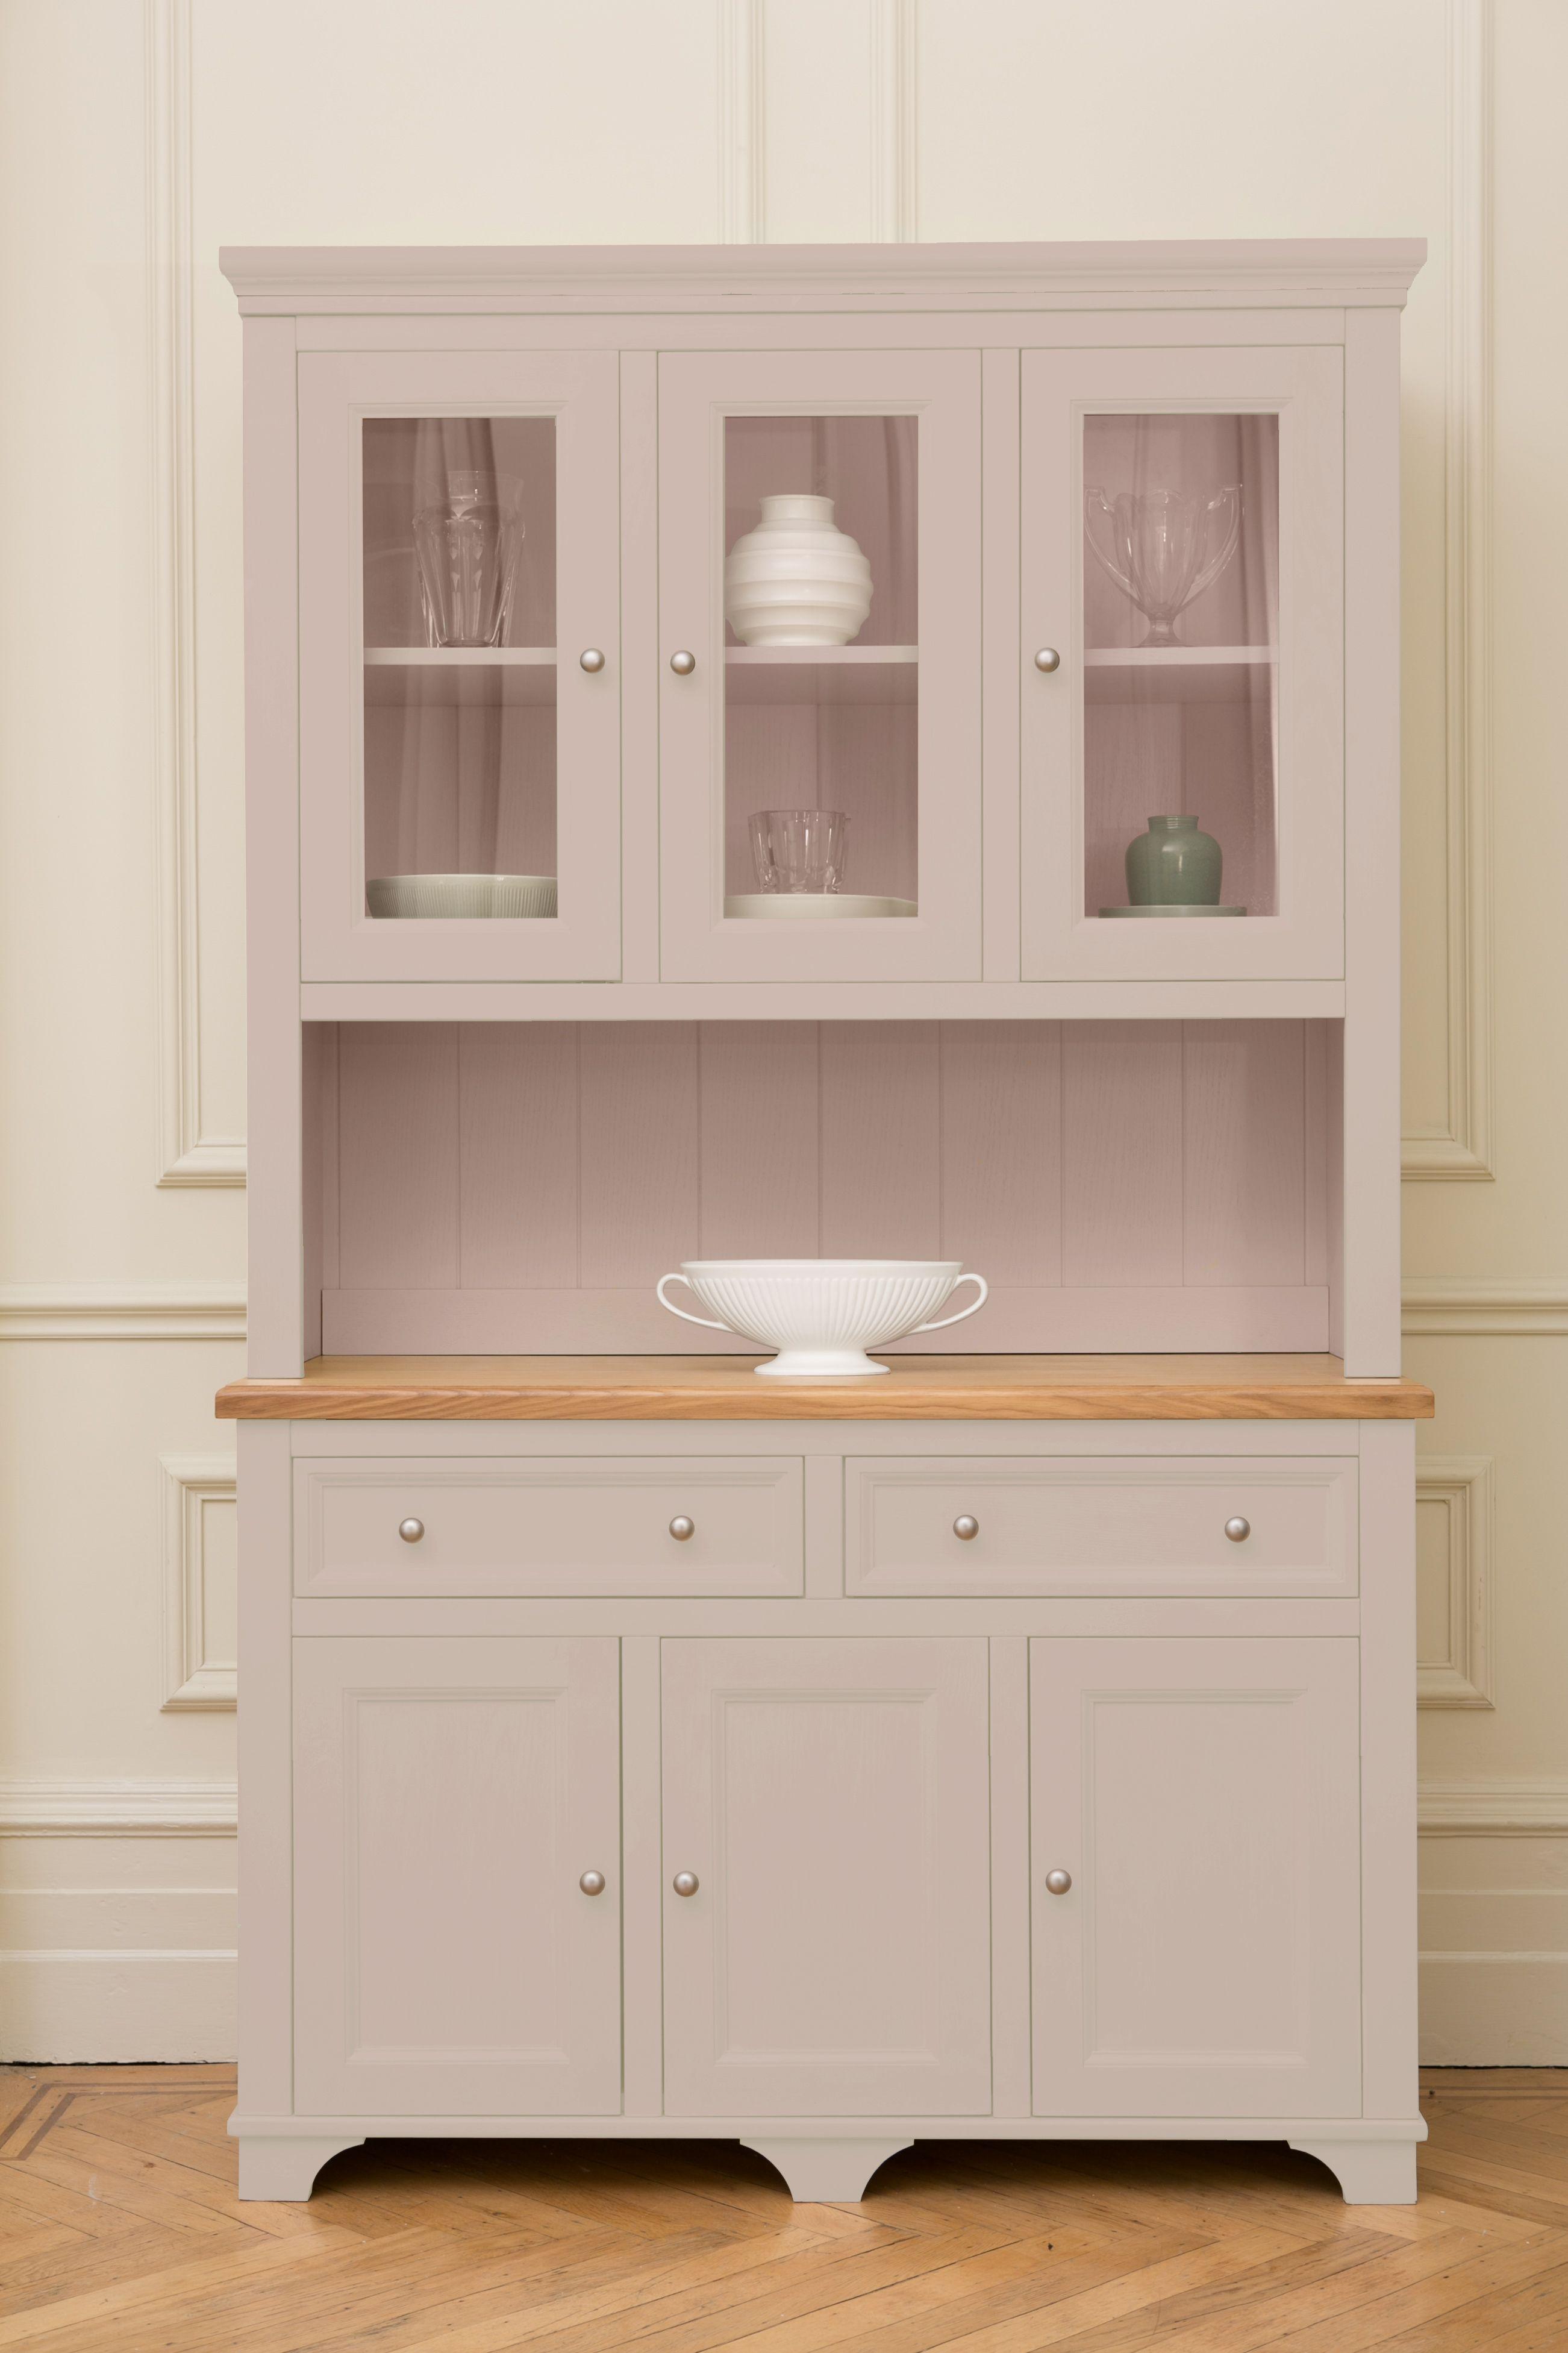 Casein Pink Kitchen Dresser from the Limited Edition Georgian ...